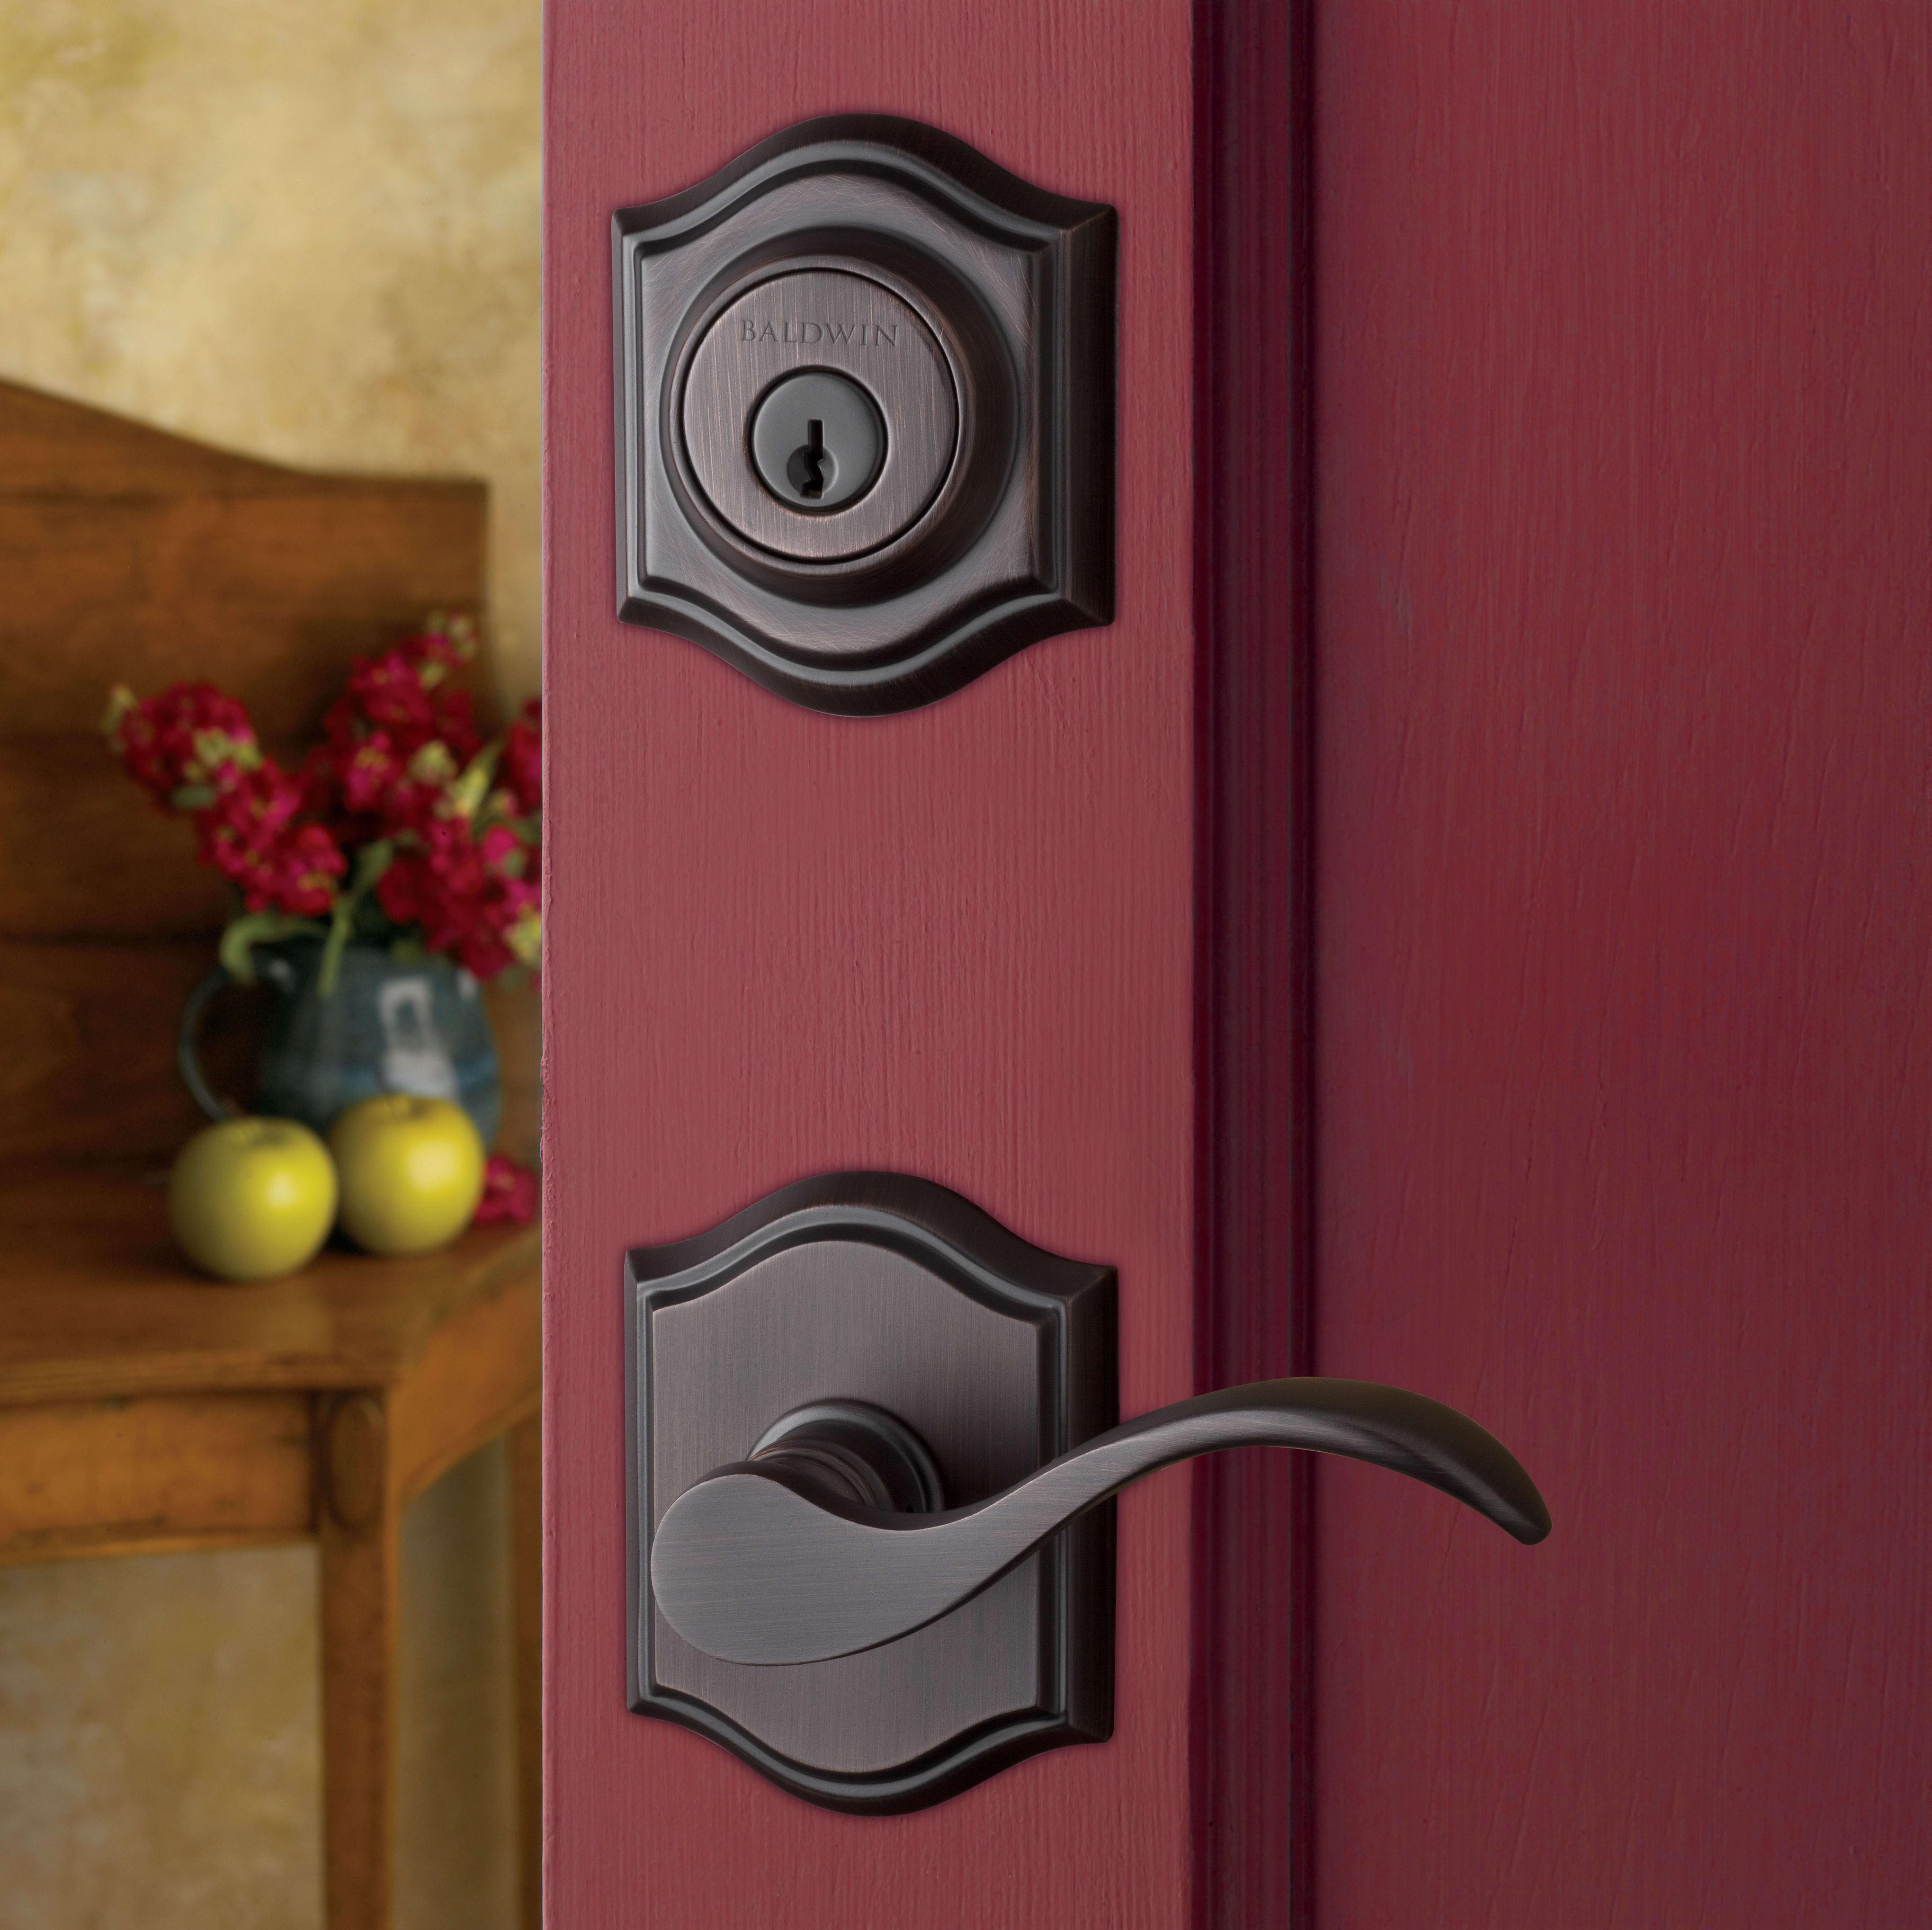 comes only sale with doorlock each hardware new prepossessing knobs design of baldwin ideas keys door brand locks